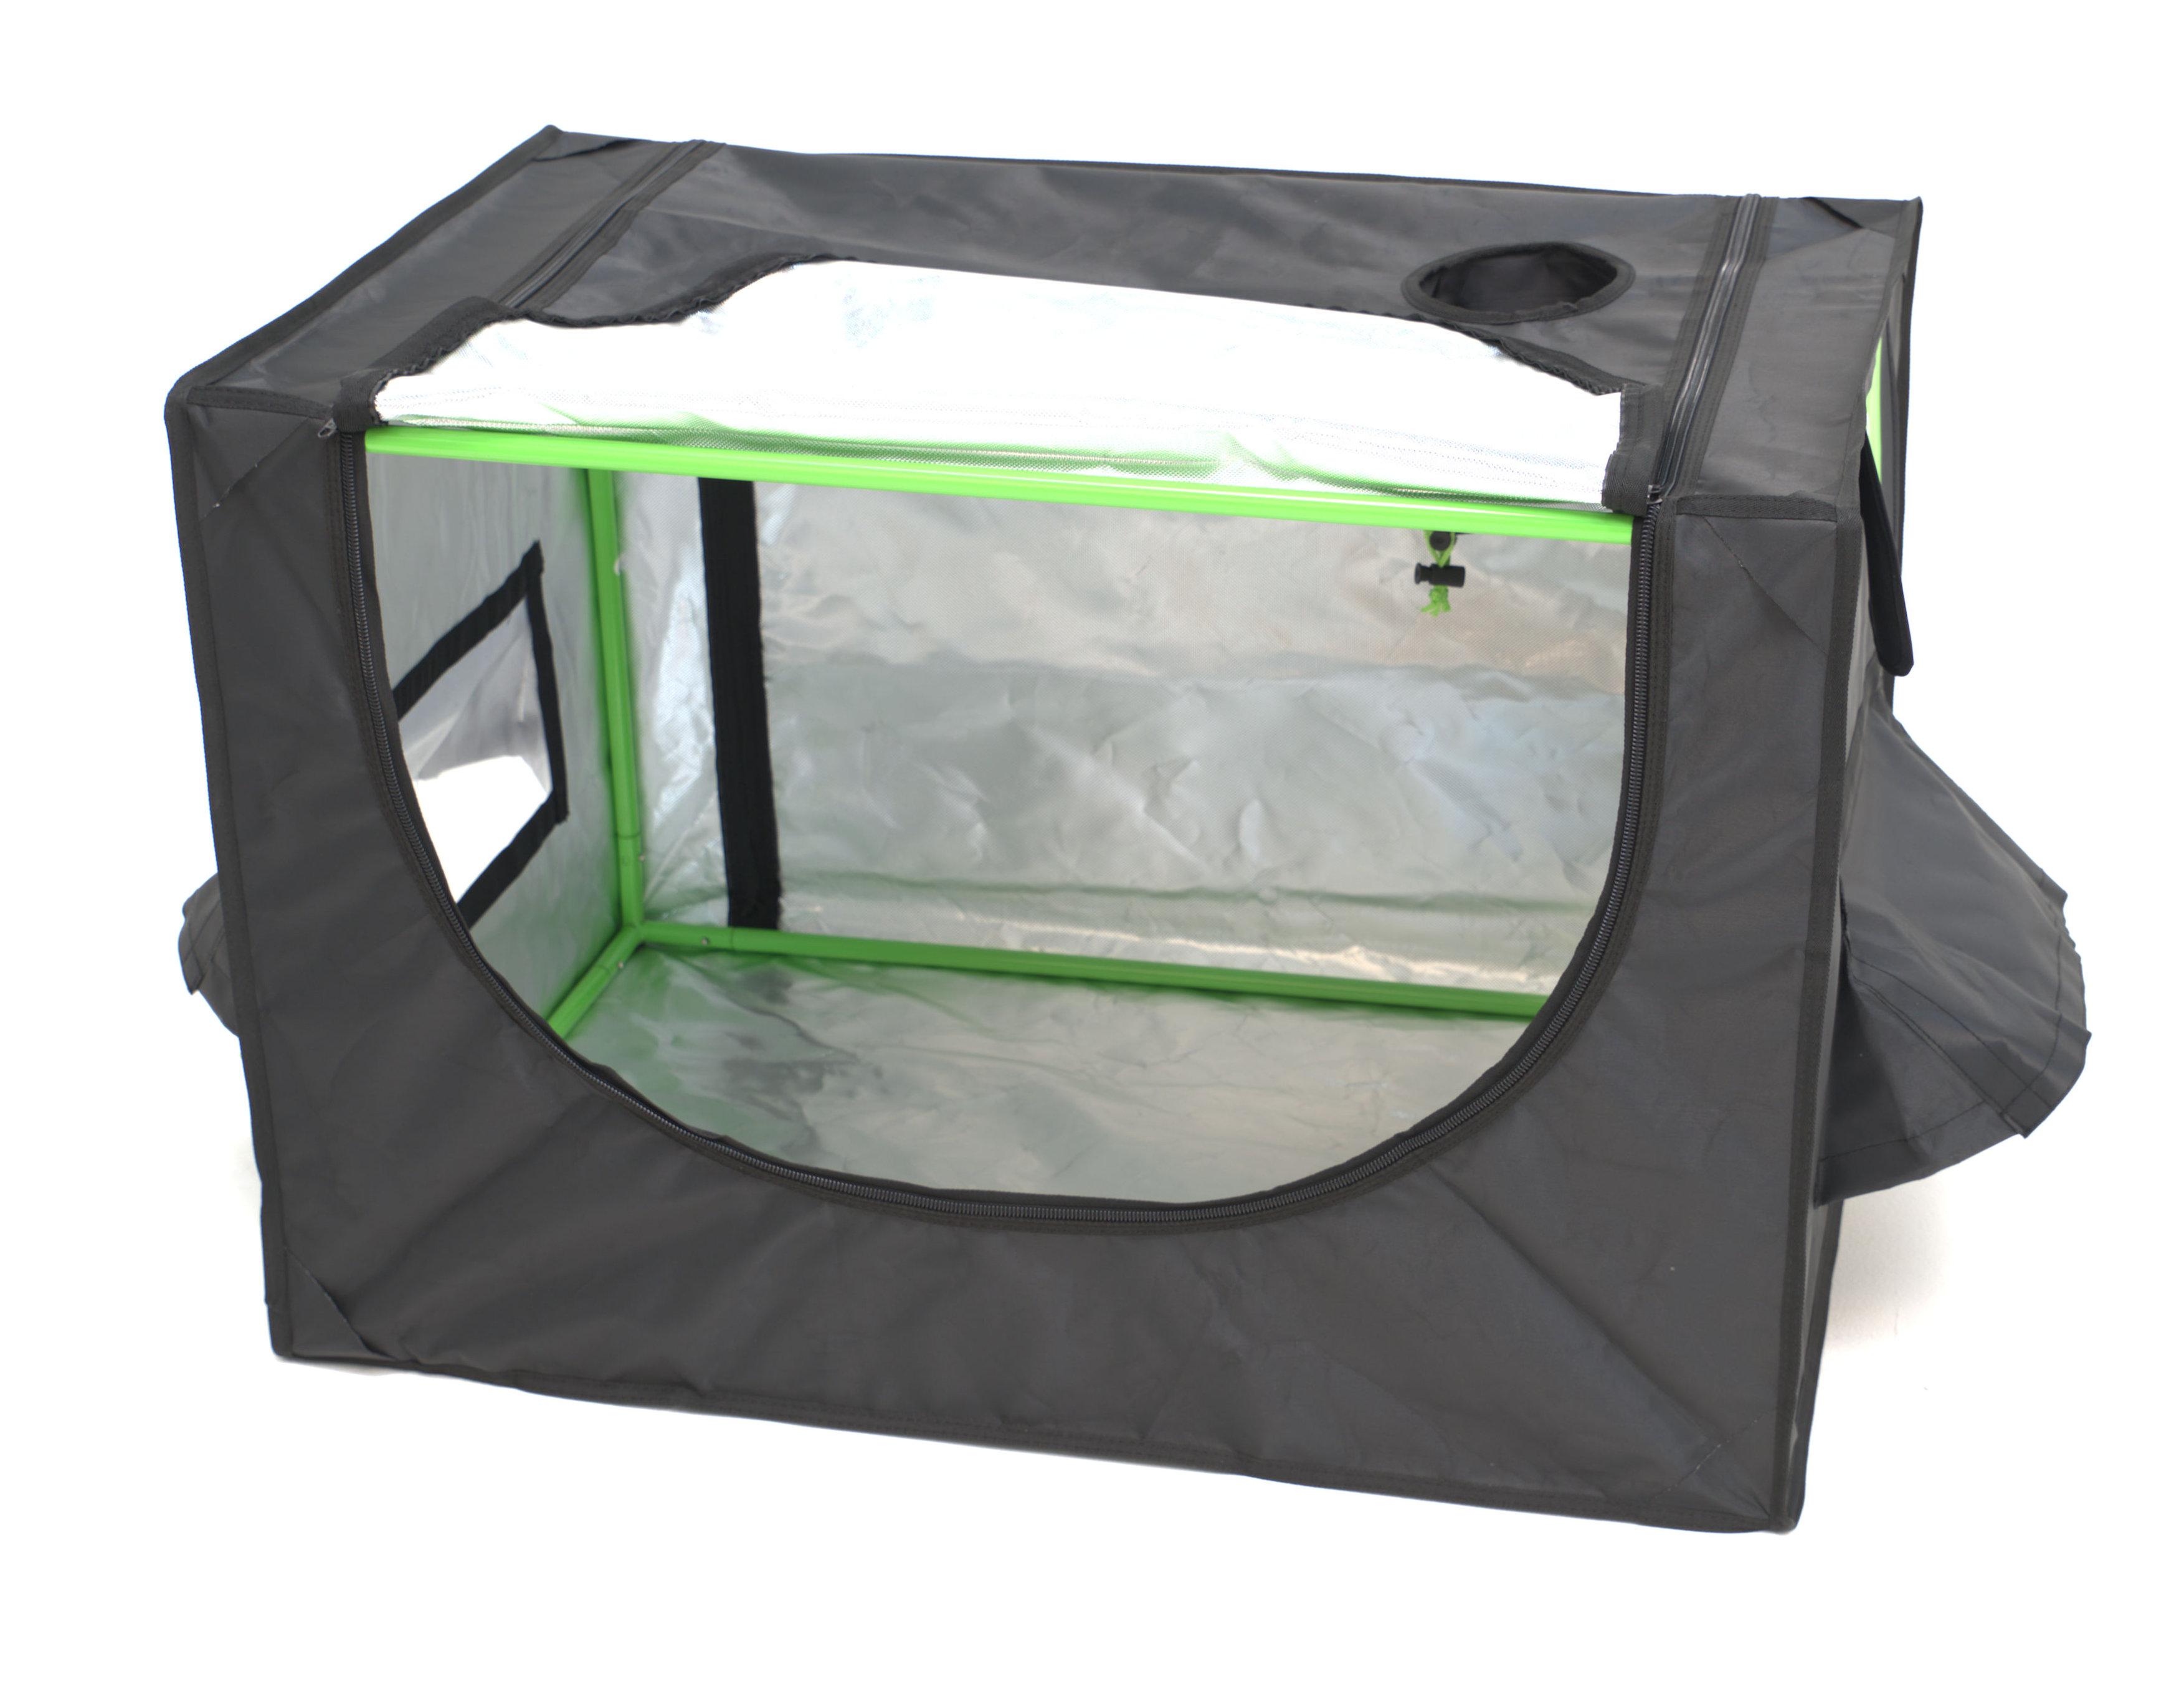 Green Qube Green-Qube 60 - 90x60x60cm